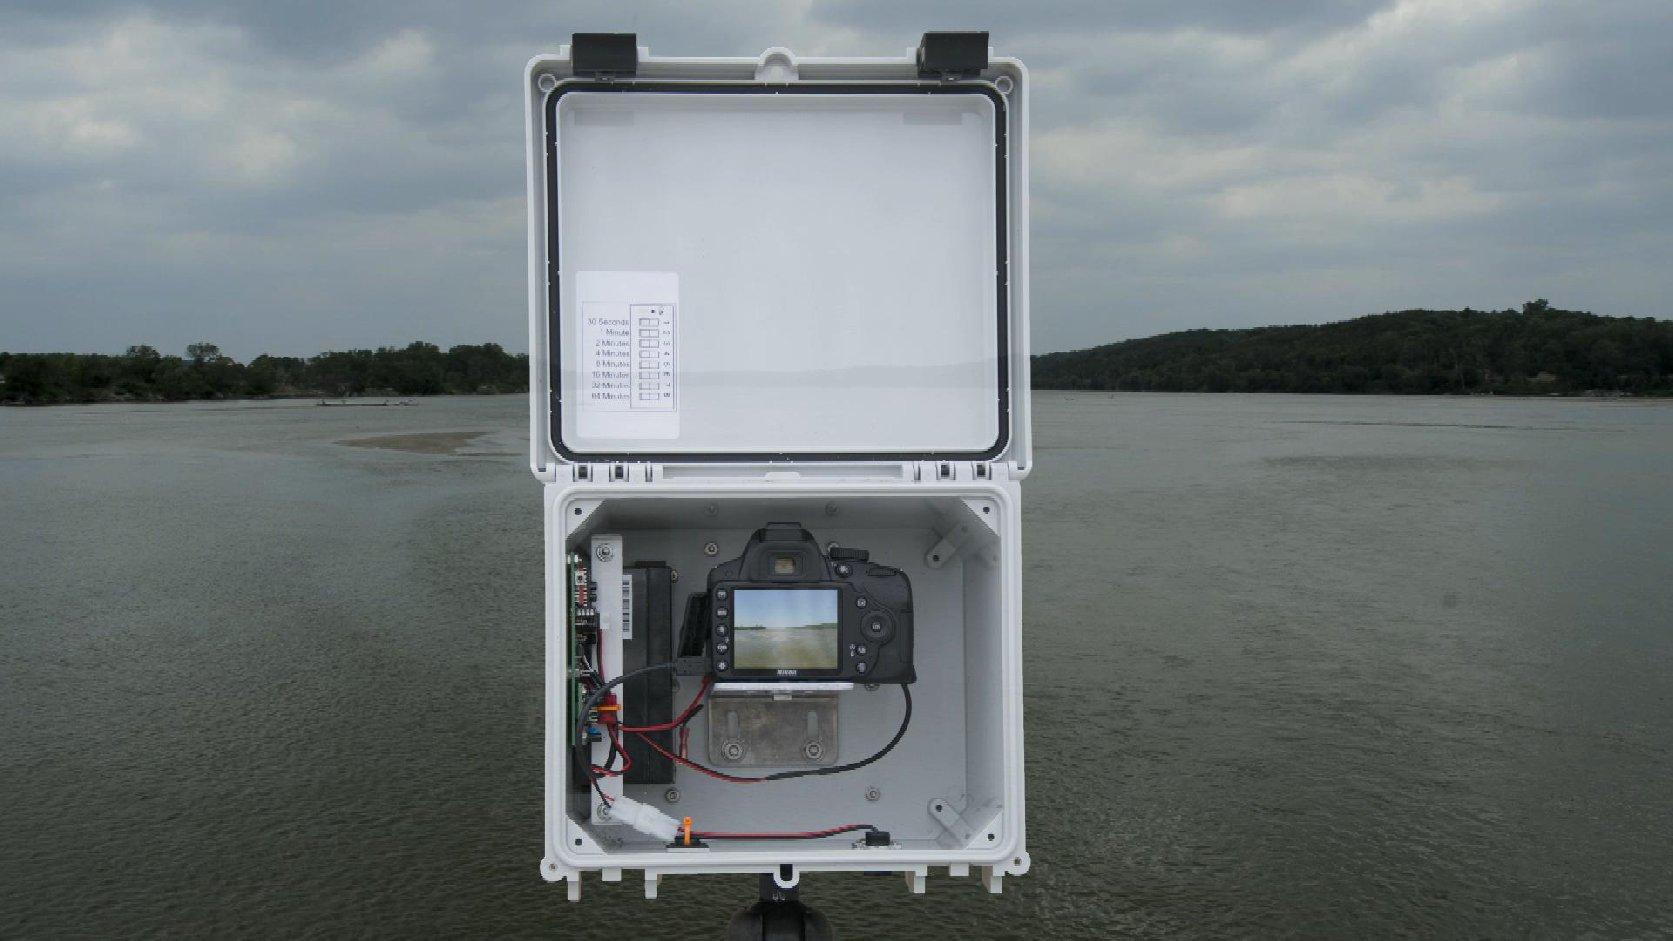 Timelapse camera and Missouri River